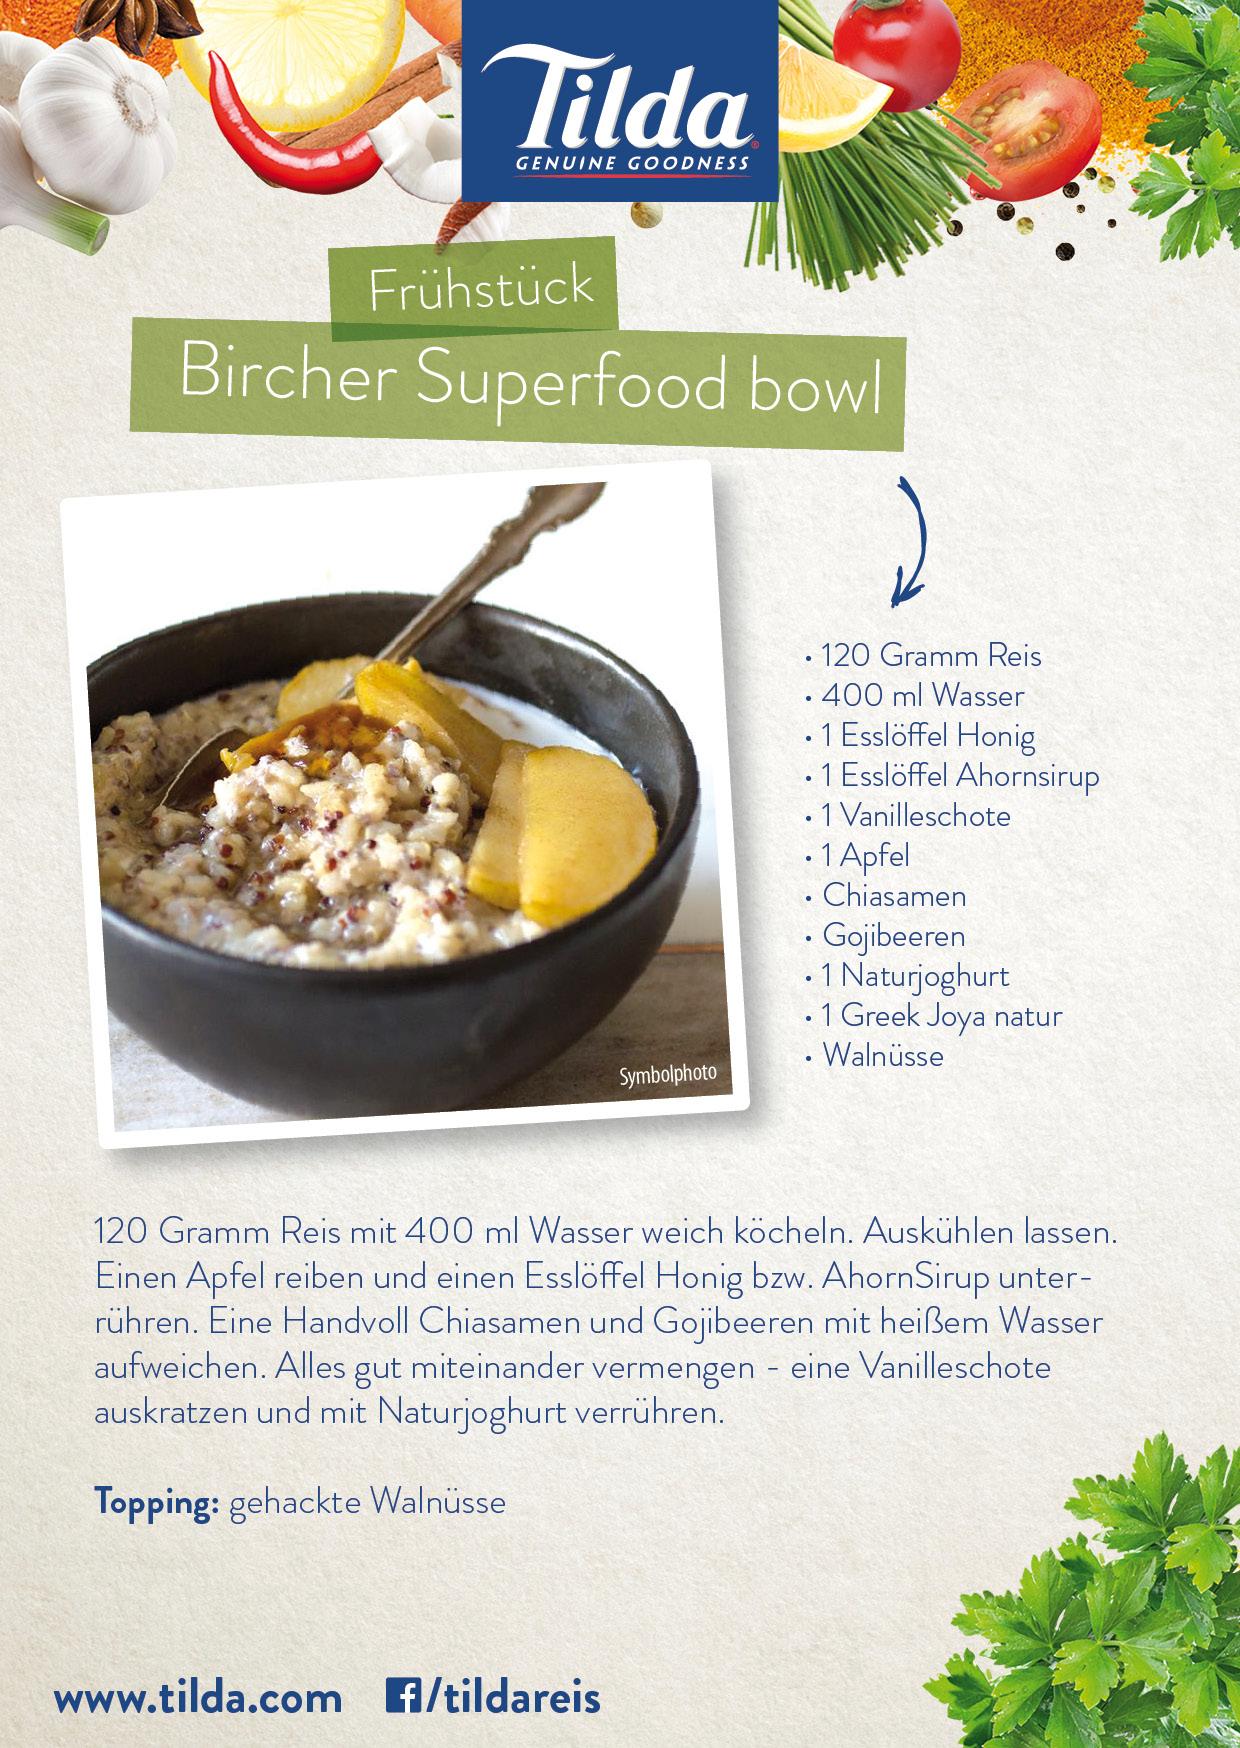 Bircher Superfood Bowl mit Tilda Basmati Reis - Freude am Kochen - vegan